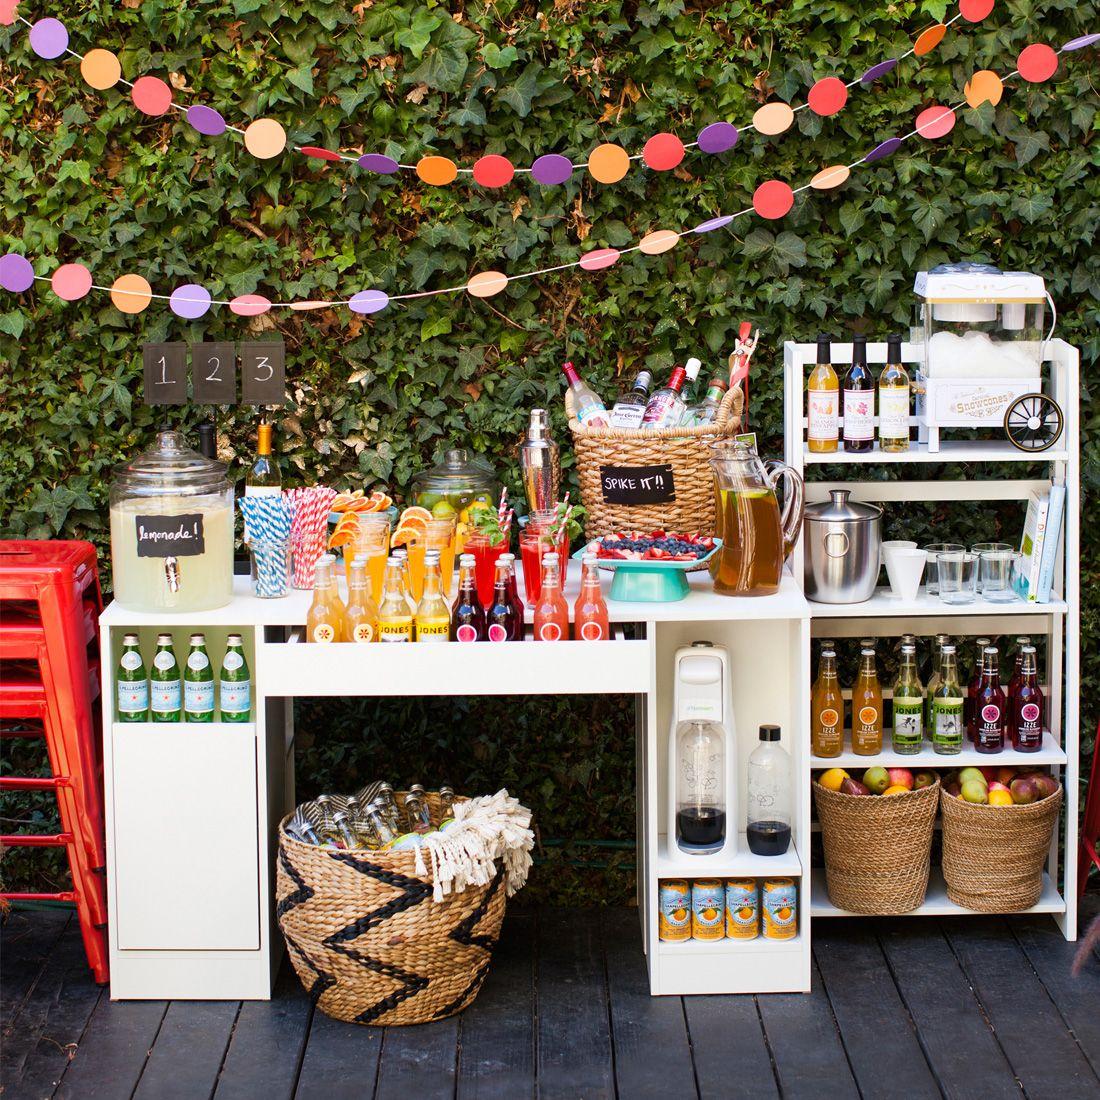 Best 25 Den Ideas Ideas On Pinterest: Best 25+ Beverage Stations Ideas On Pinterest